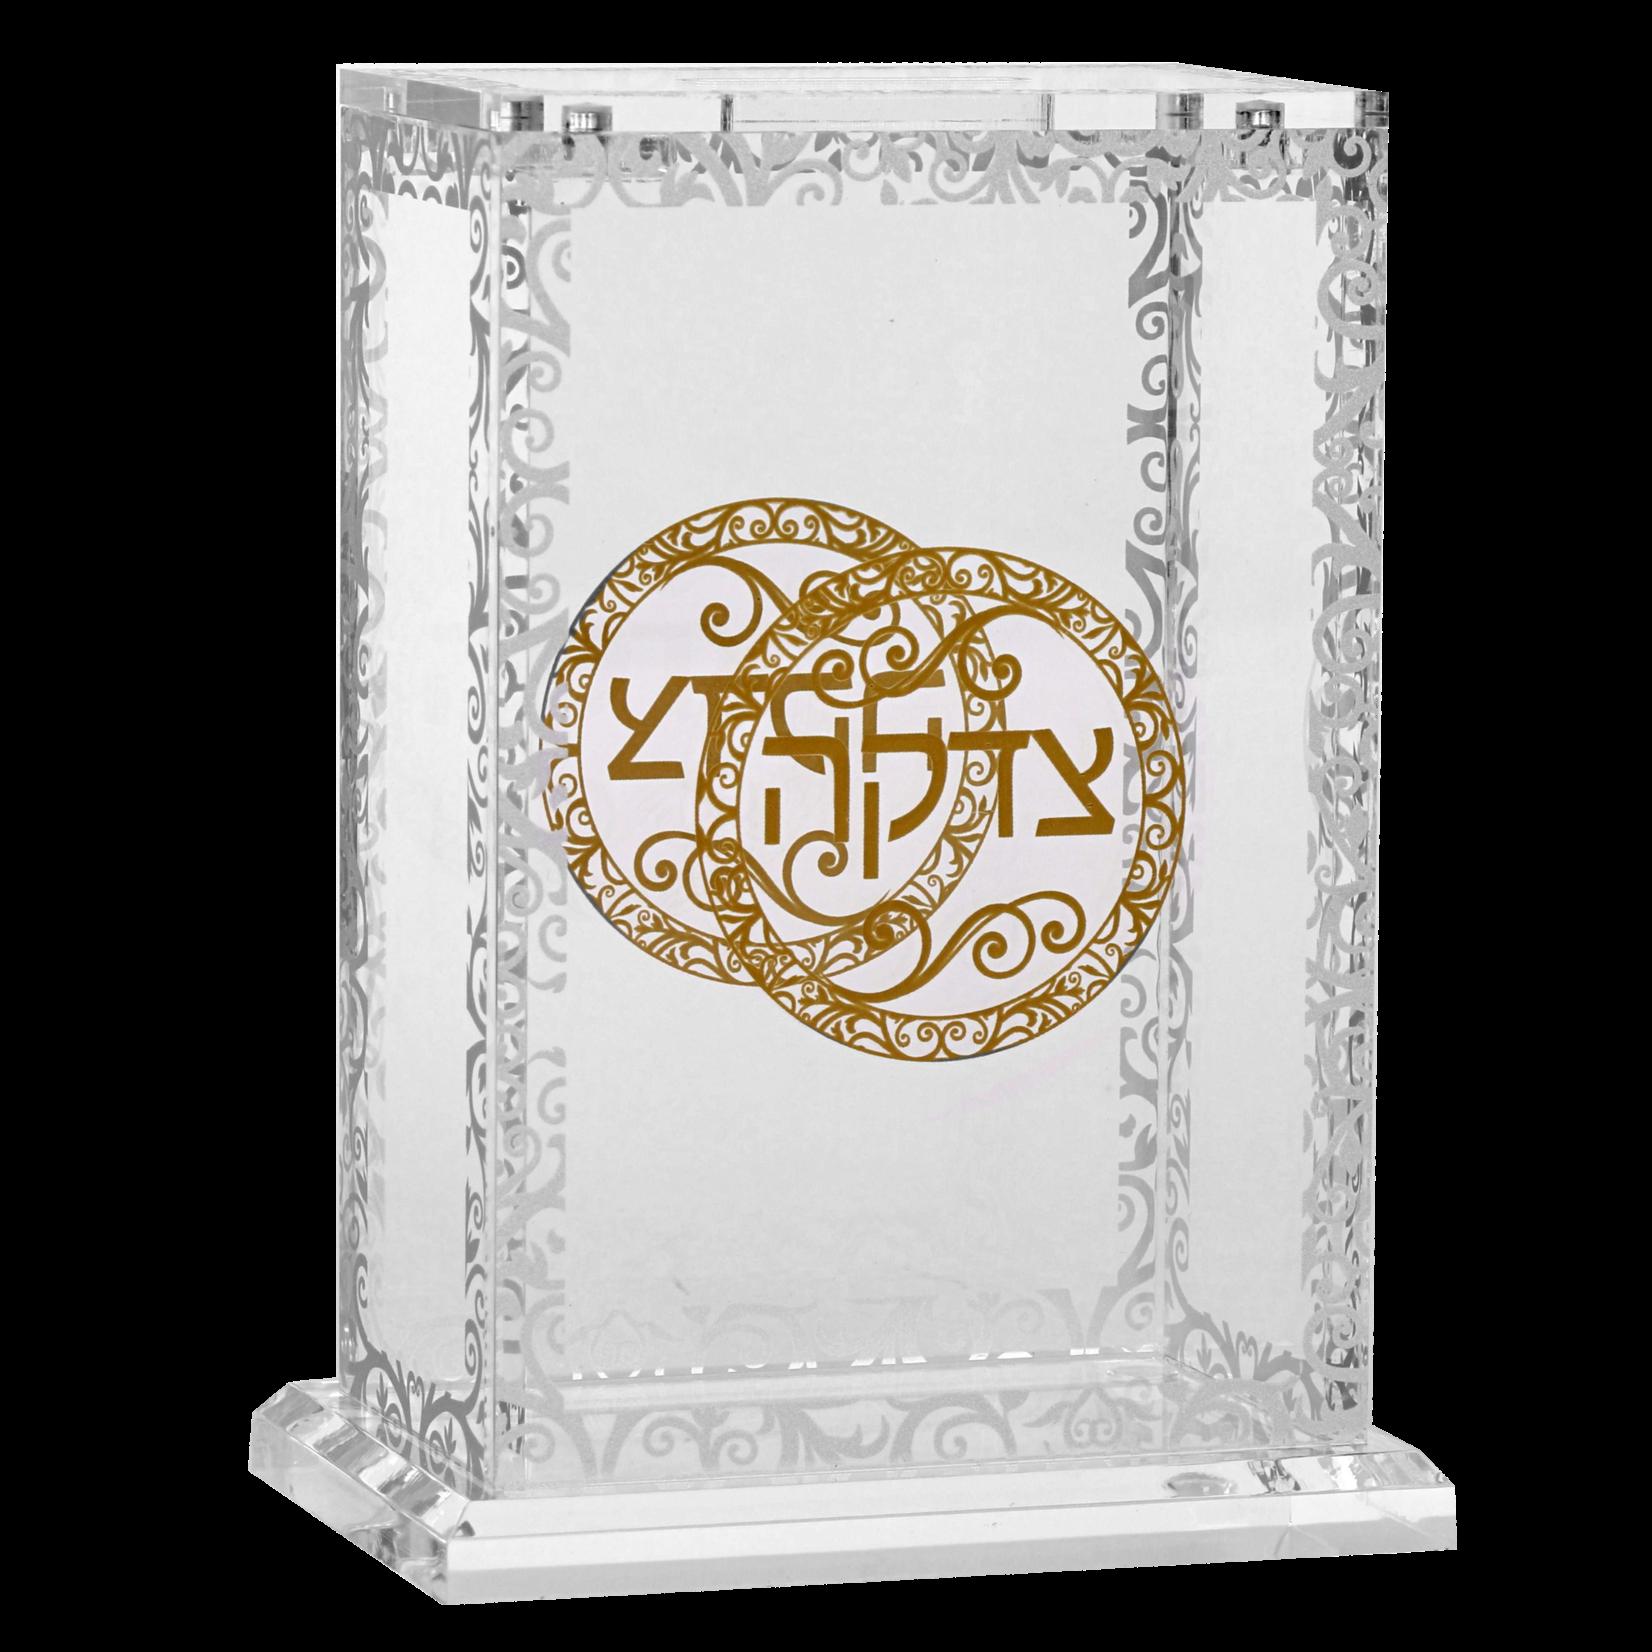 182031 Acrylic Charity Box Royal Design